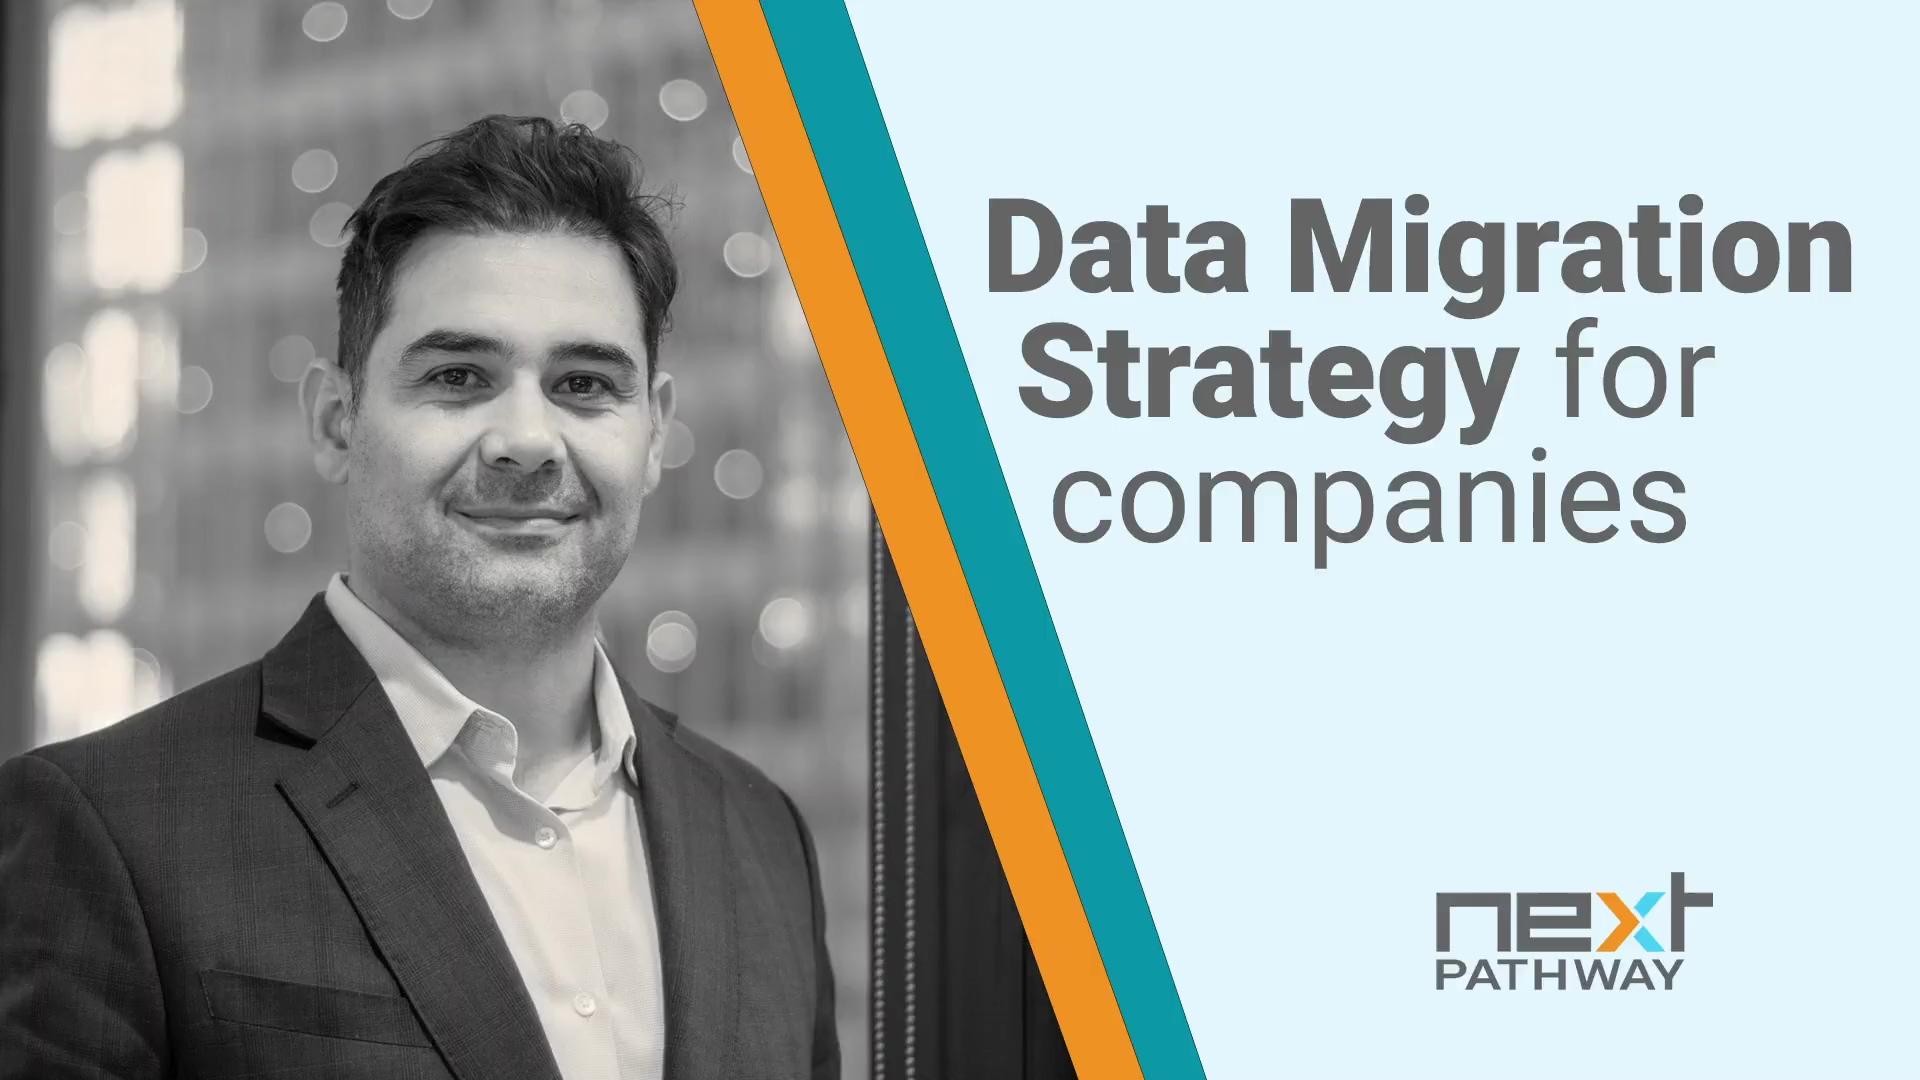 Key Data Migration Strategies